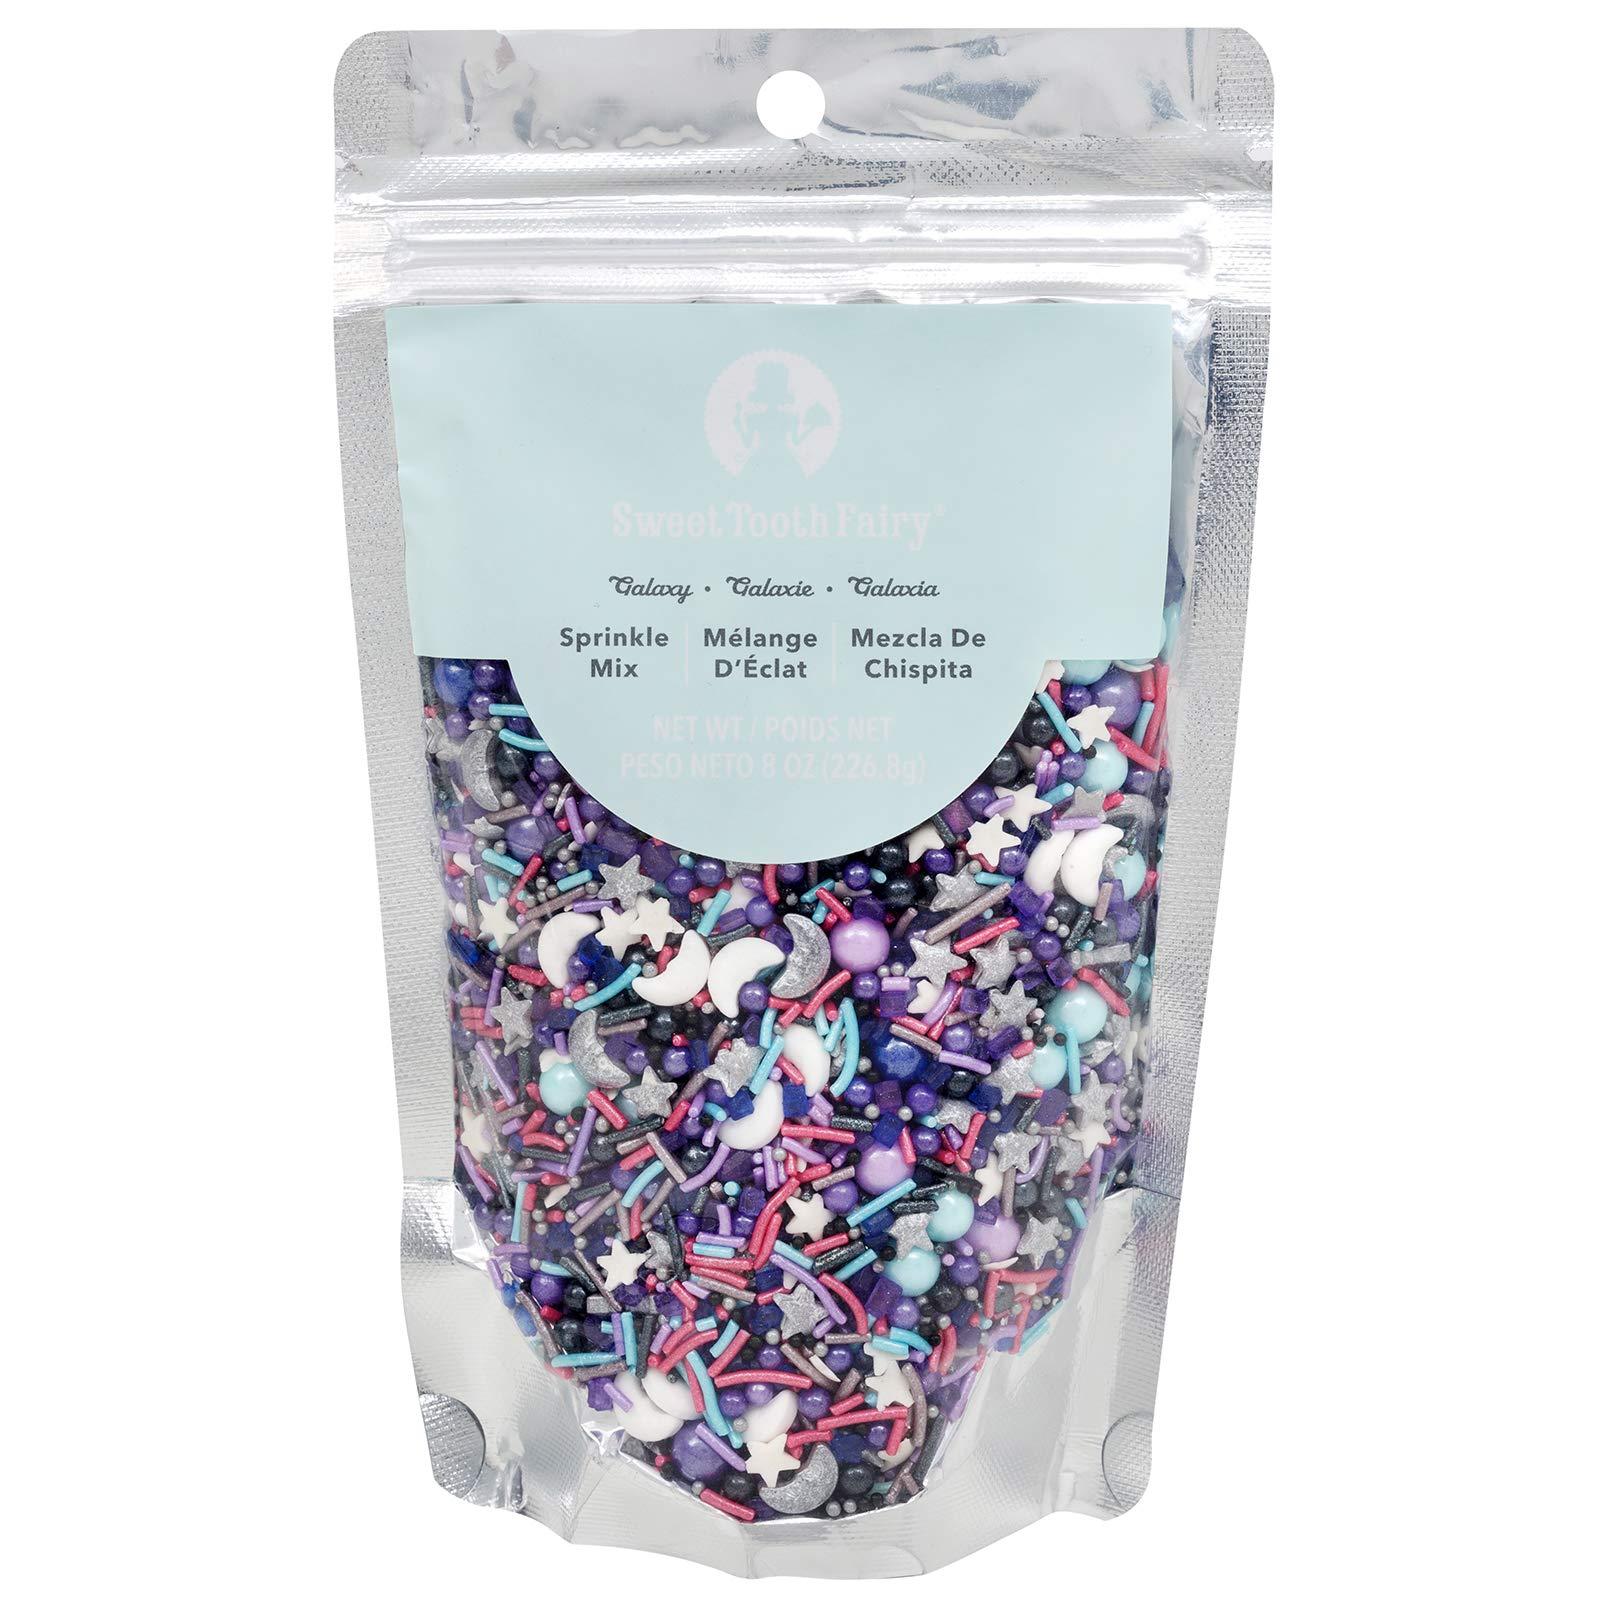 Sweet Tooth Fairy Galaxy Sprinkles, Original version, Multicolor